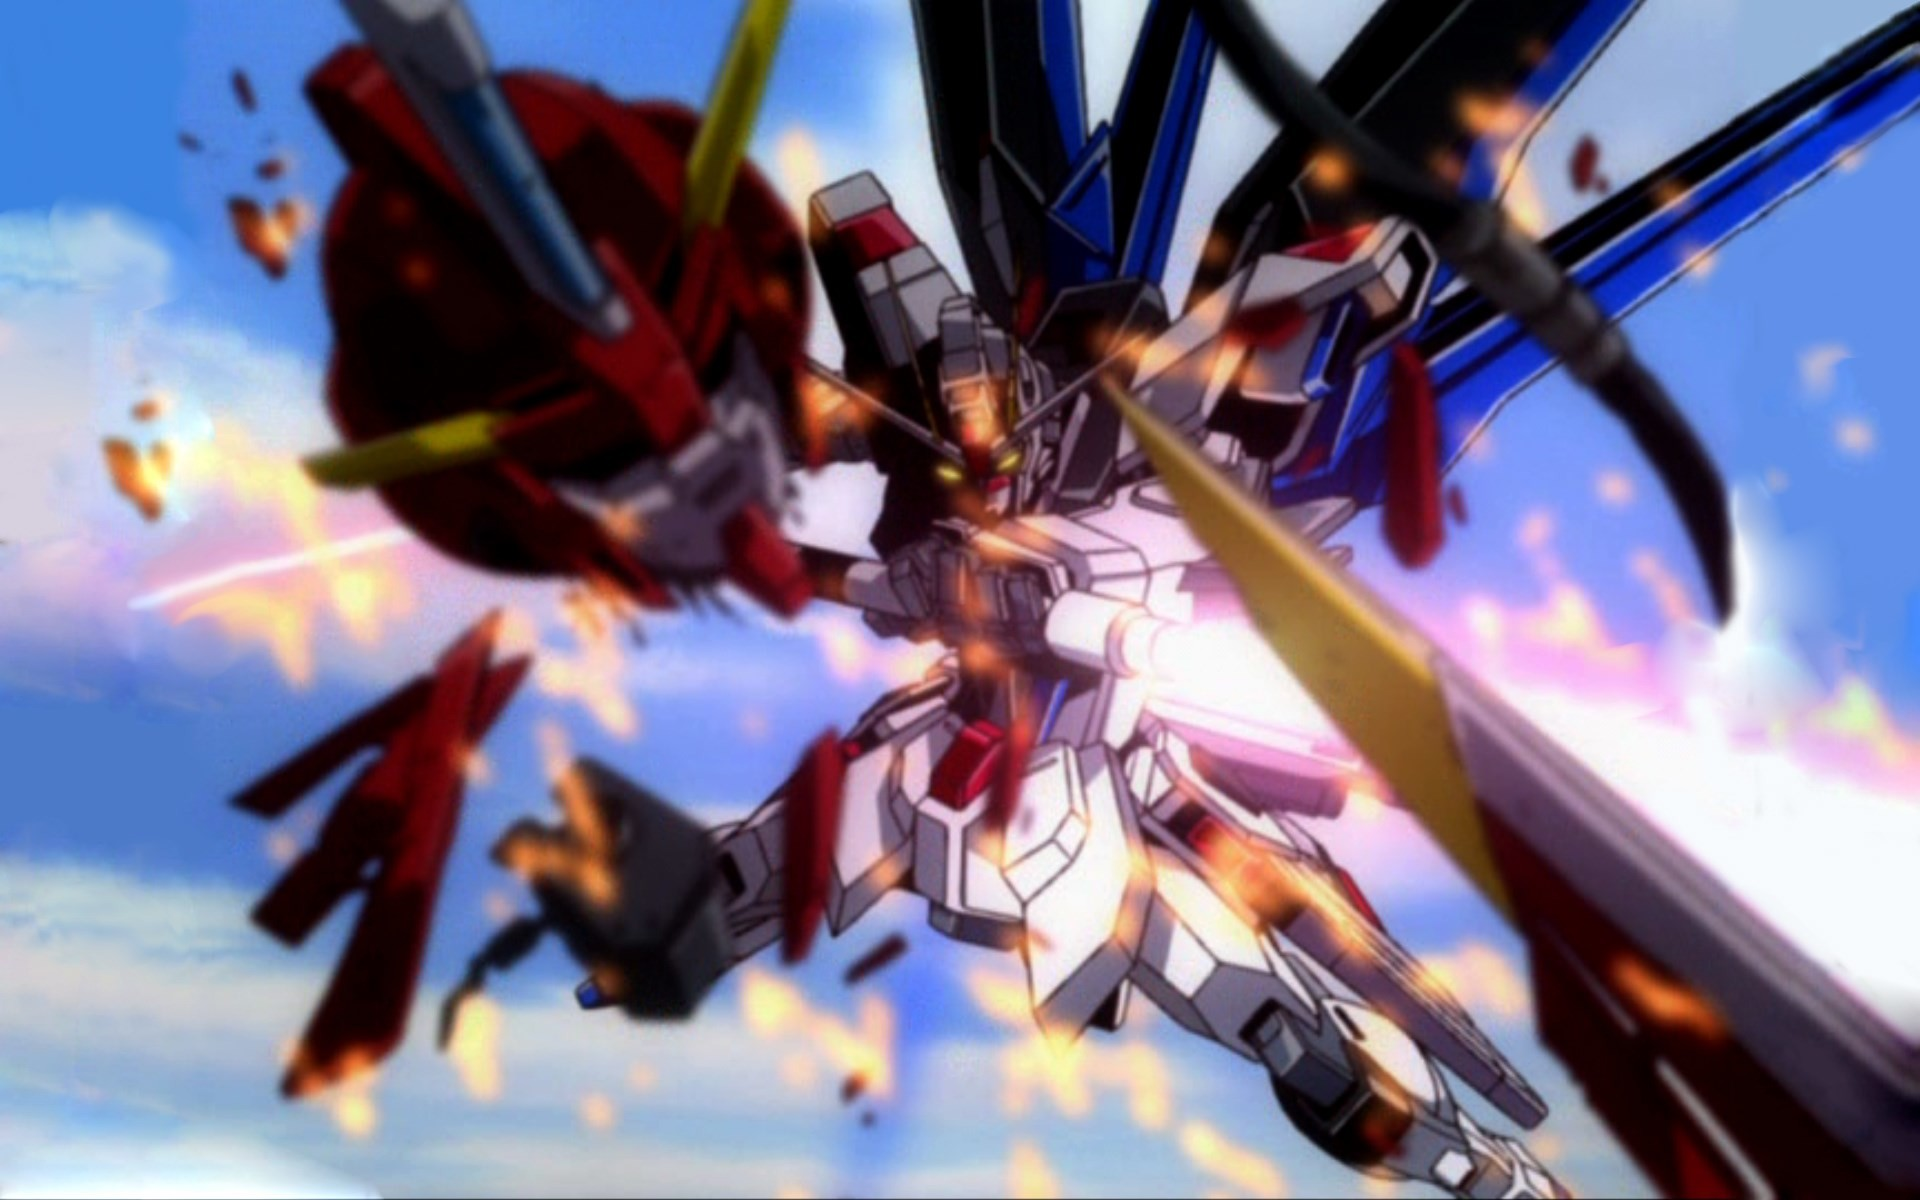 Gundam Seed Destiny Wallpaper 59 Images